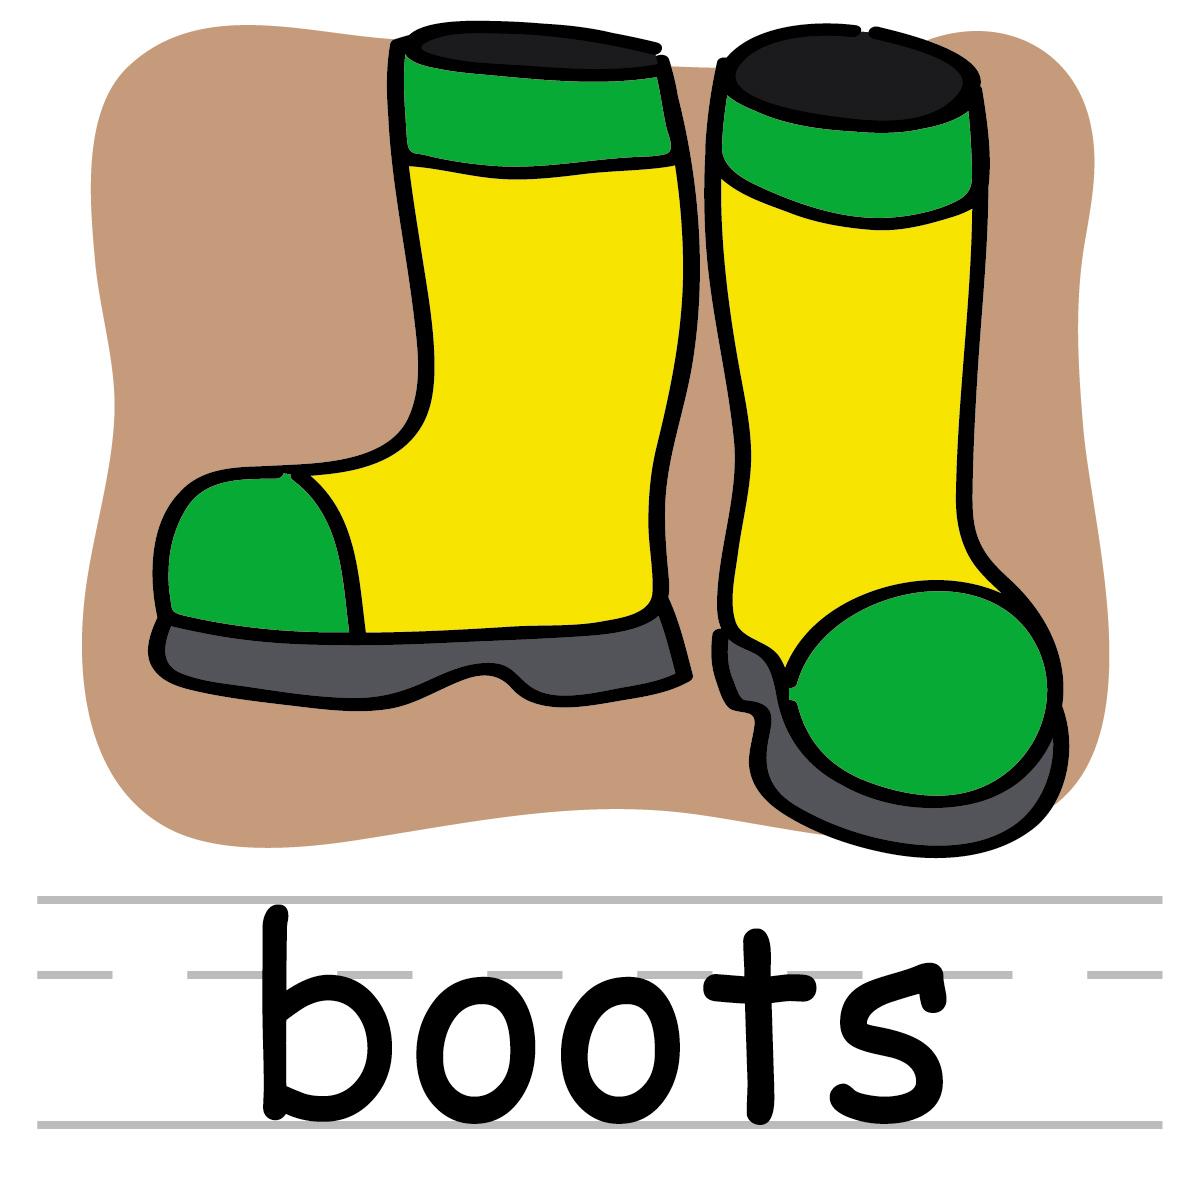 Boots fashion pic boots clip art - Boots Clip Art